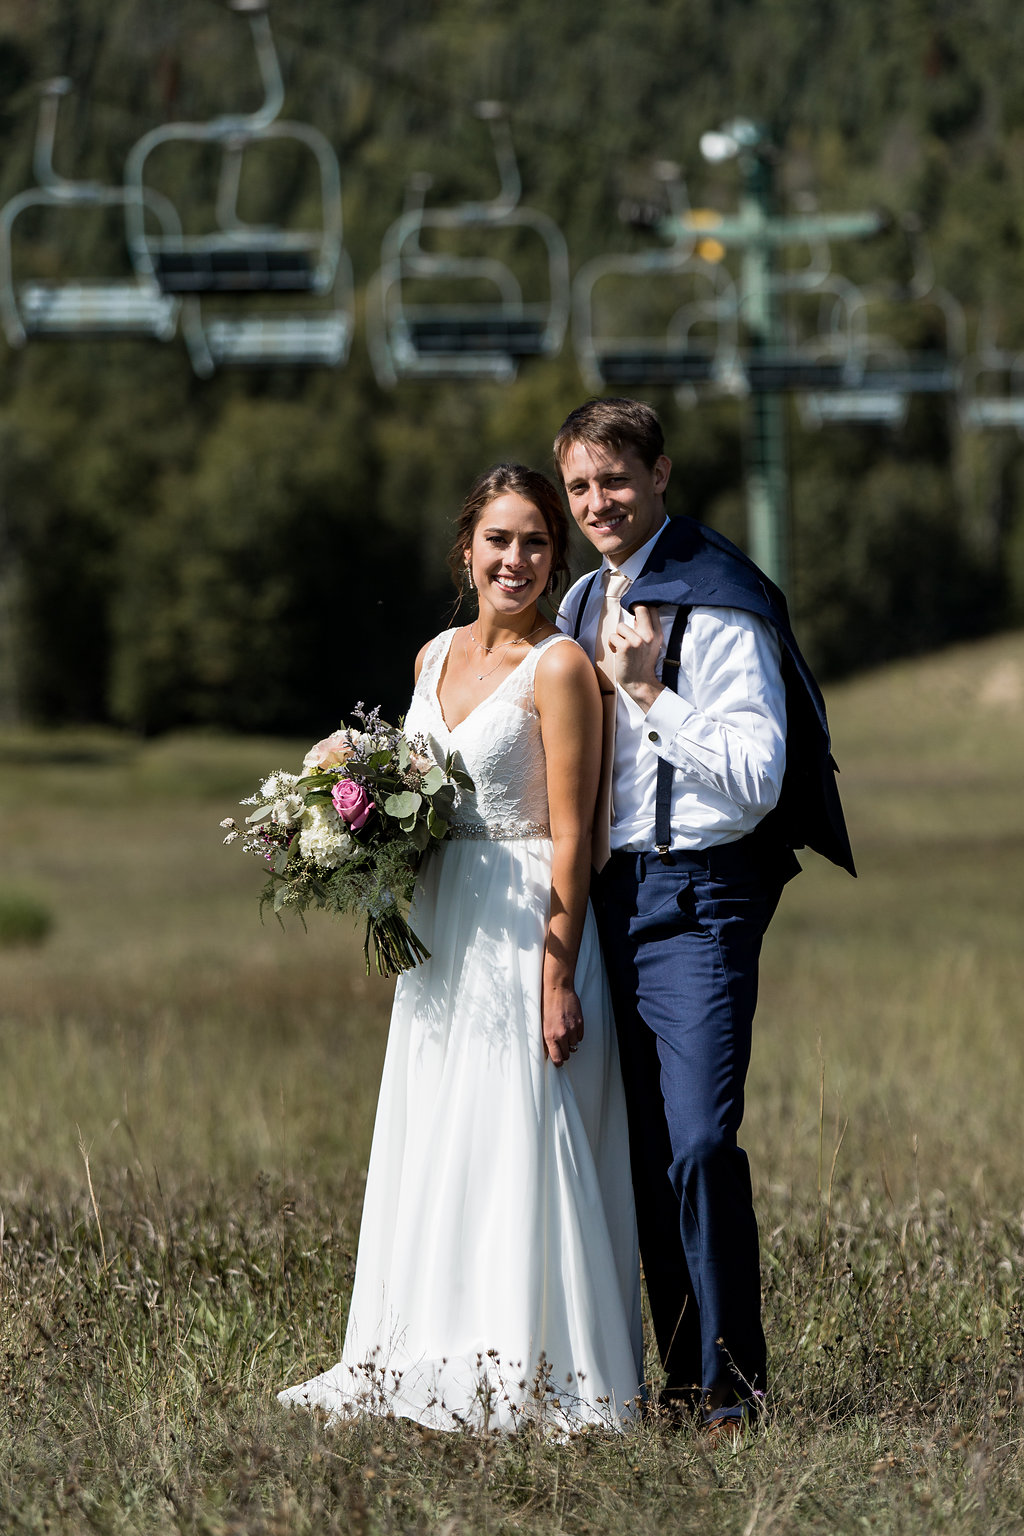 Sonshine_barn_northern_michigan_wedding_-51.jpg